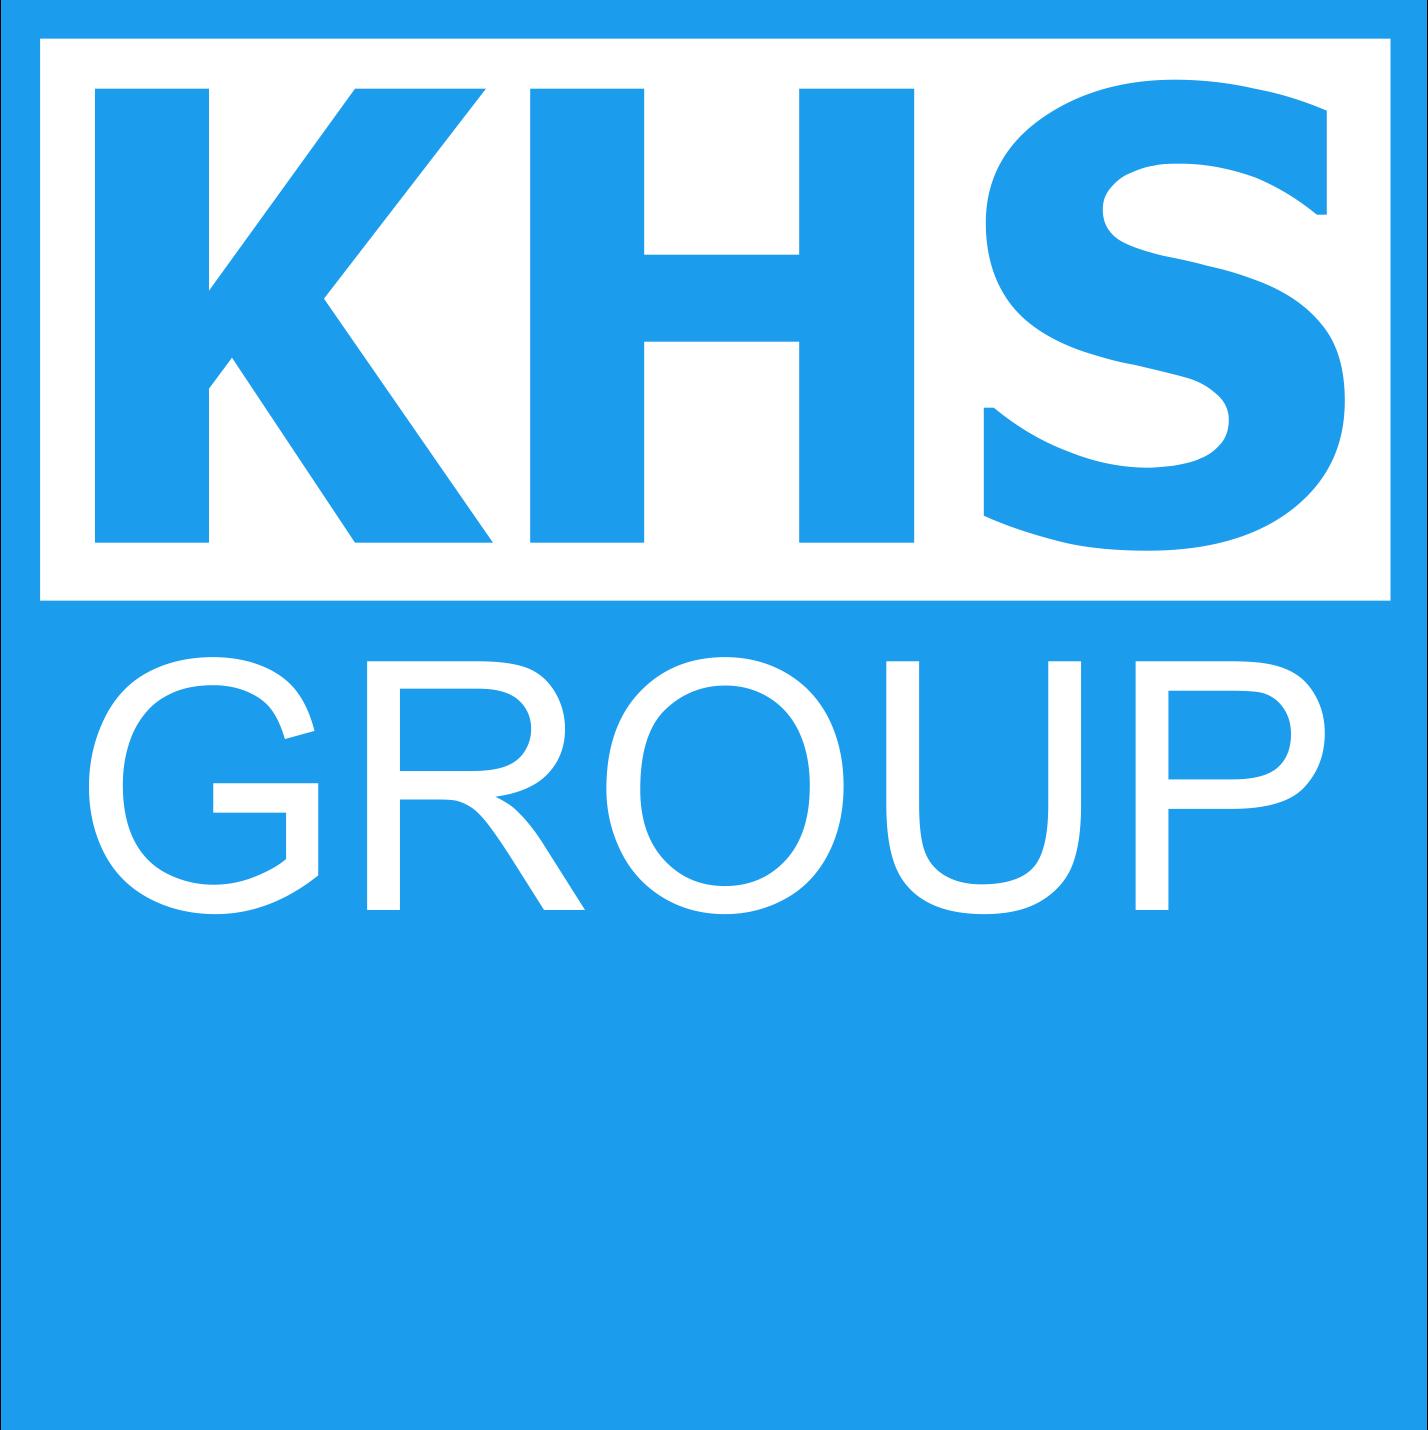 (c) Khs-group.com.ua